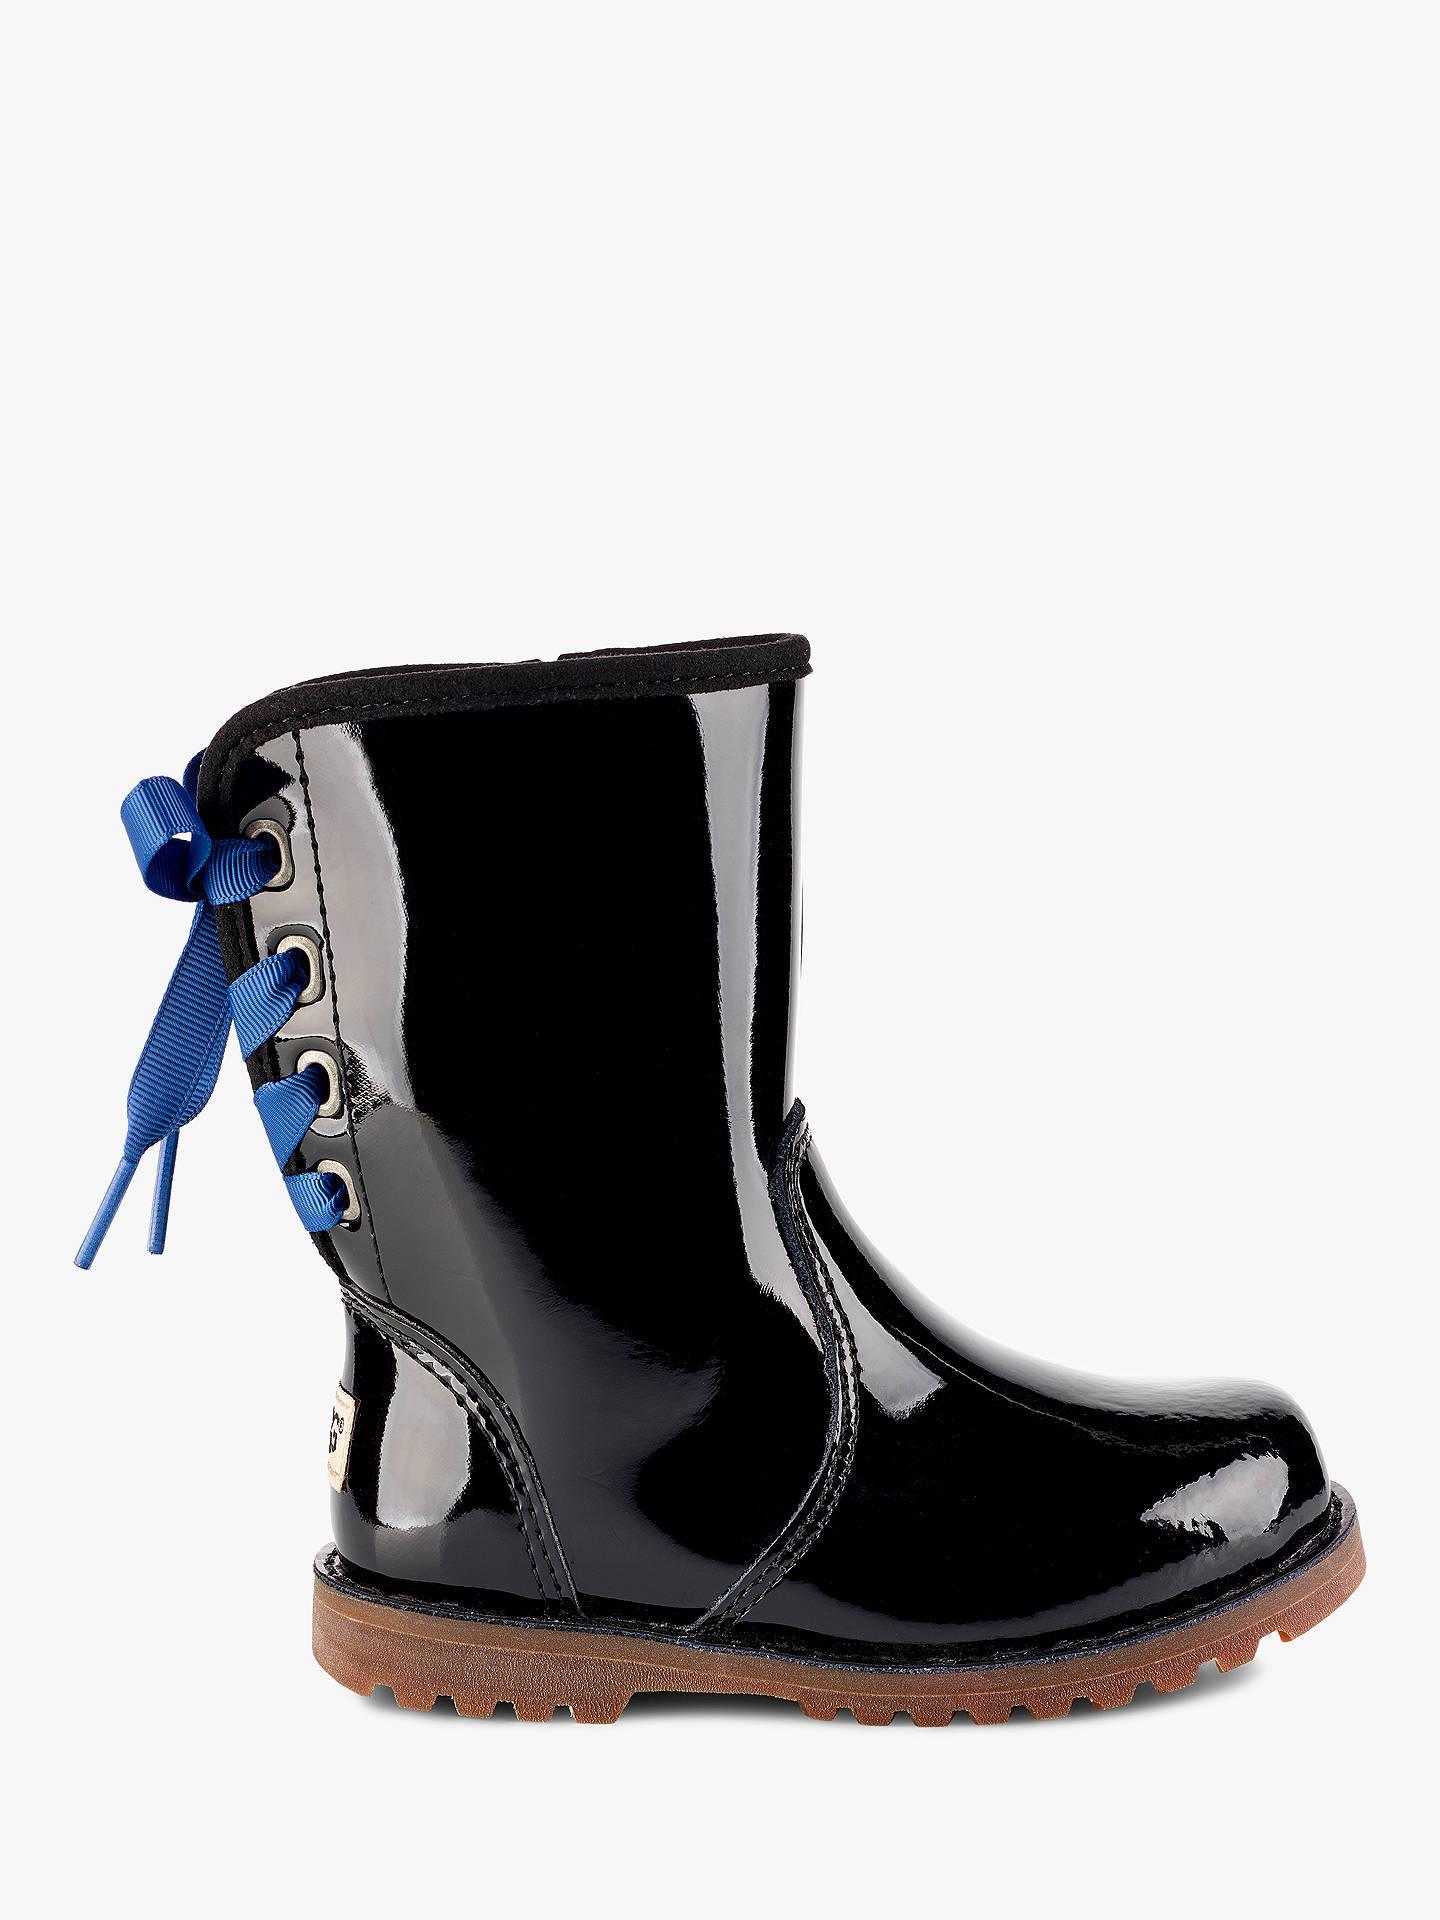 a6651704bc5 UGG Children's Corene Boot, Black Patent at John Lewis & Partners